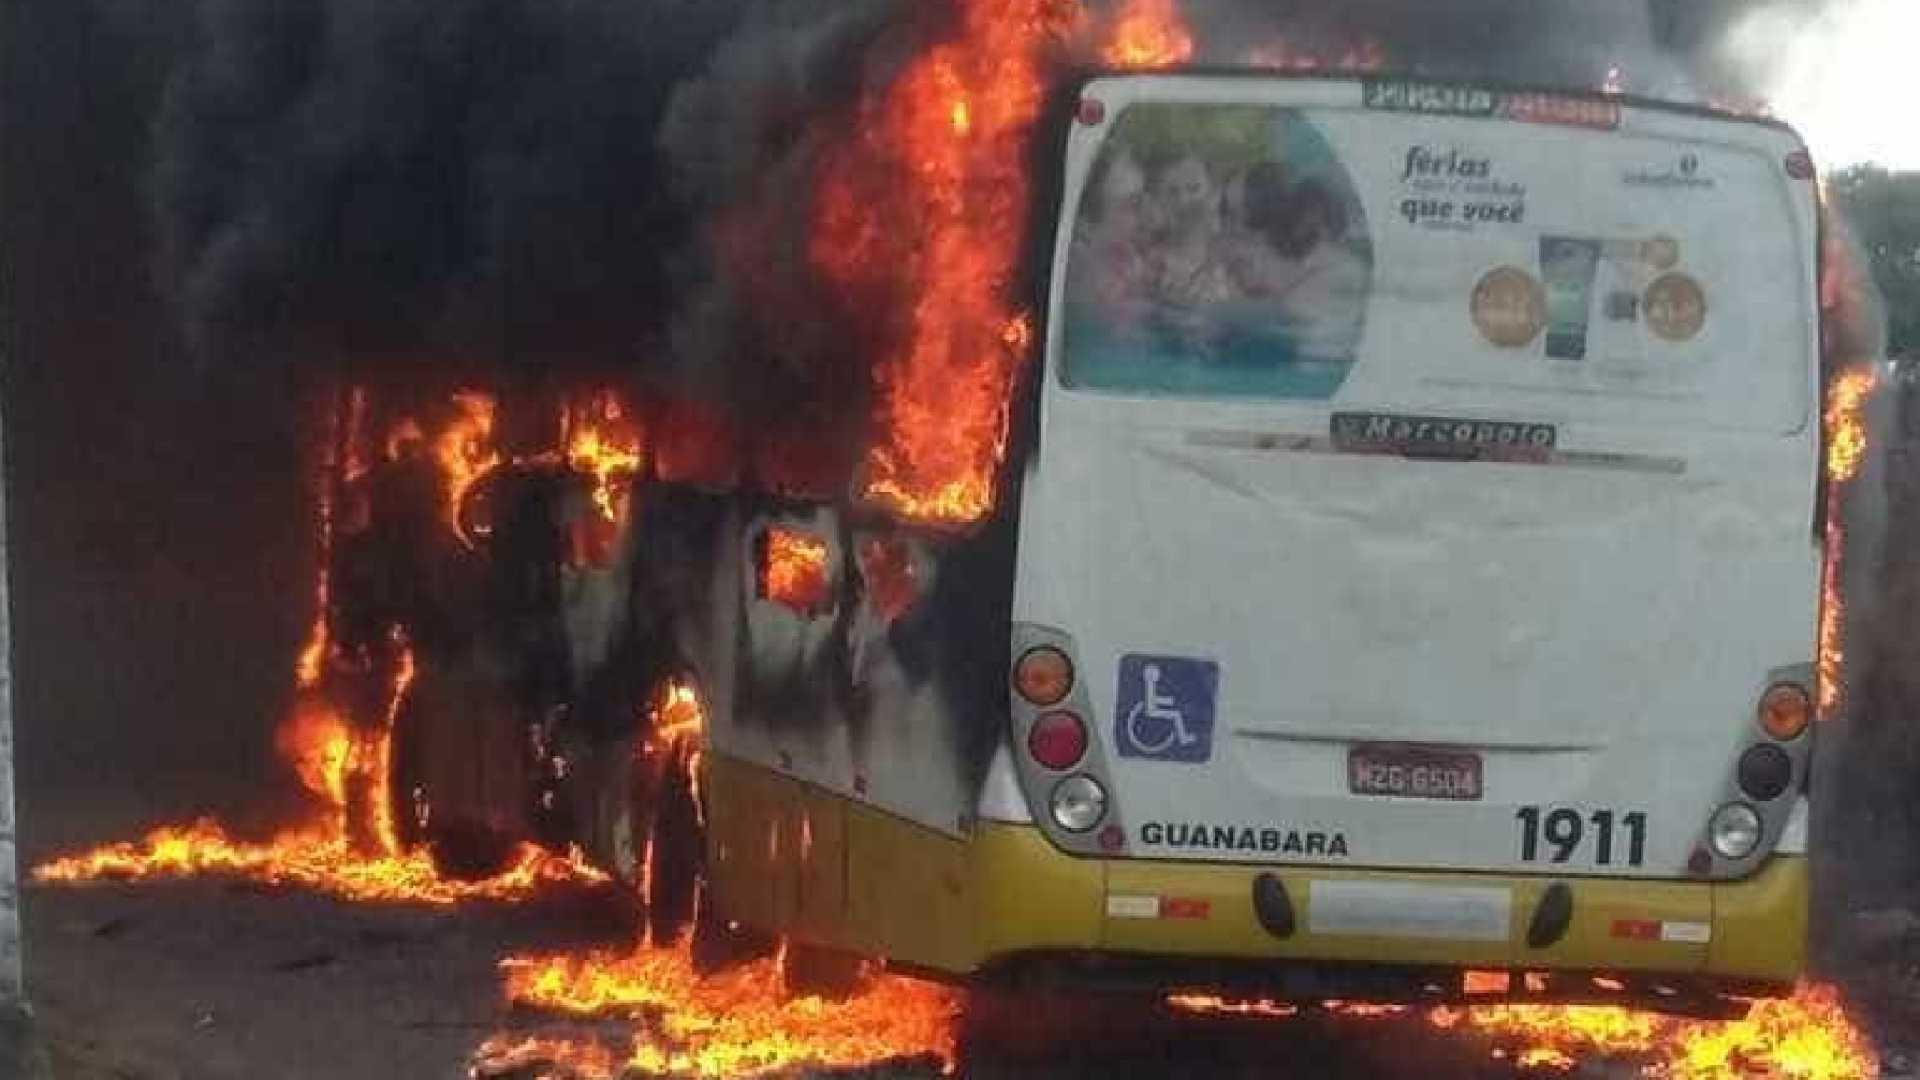 onibus queimado em natal bairro nordeste